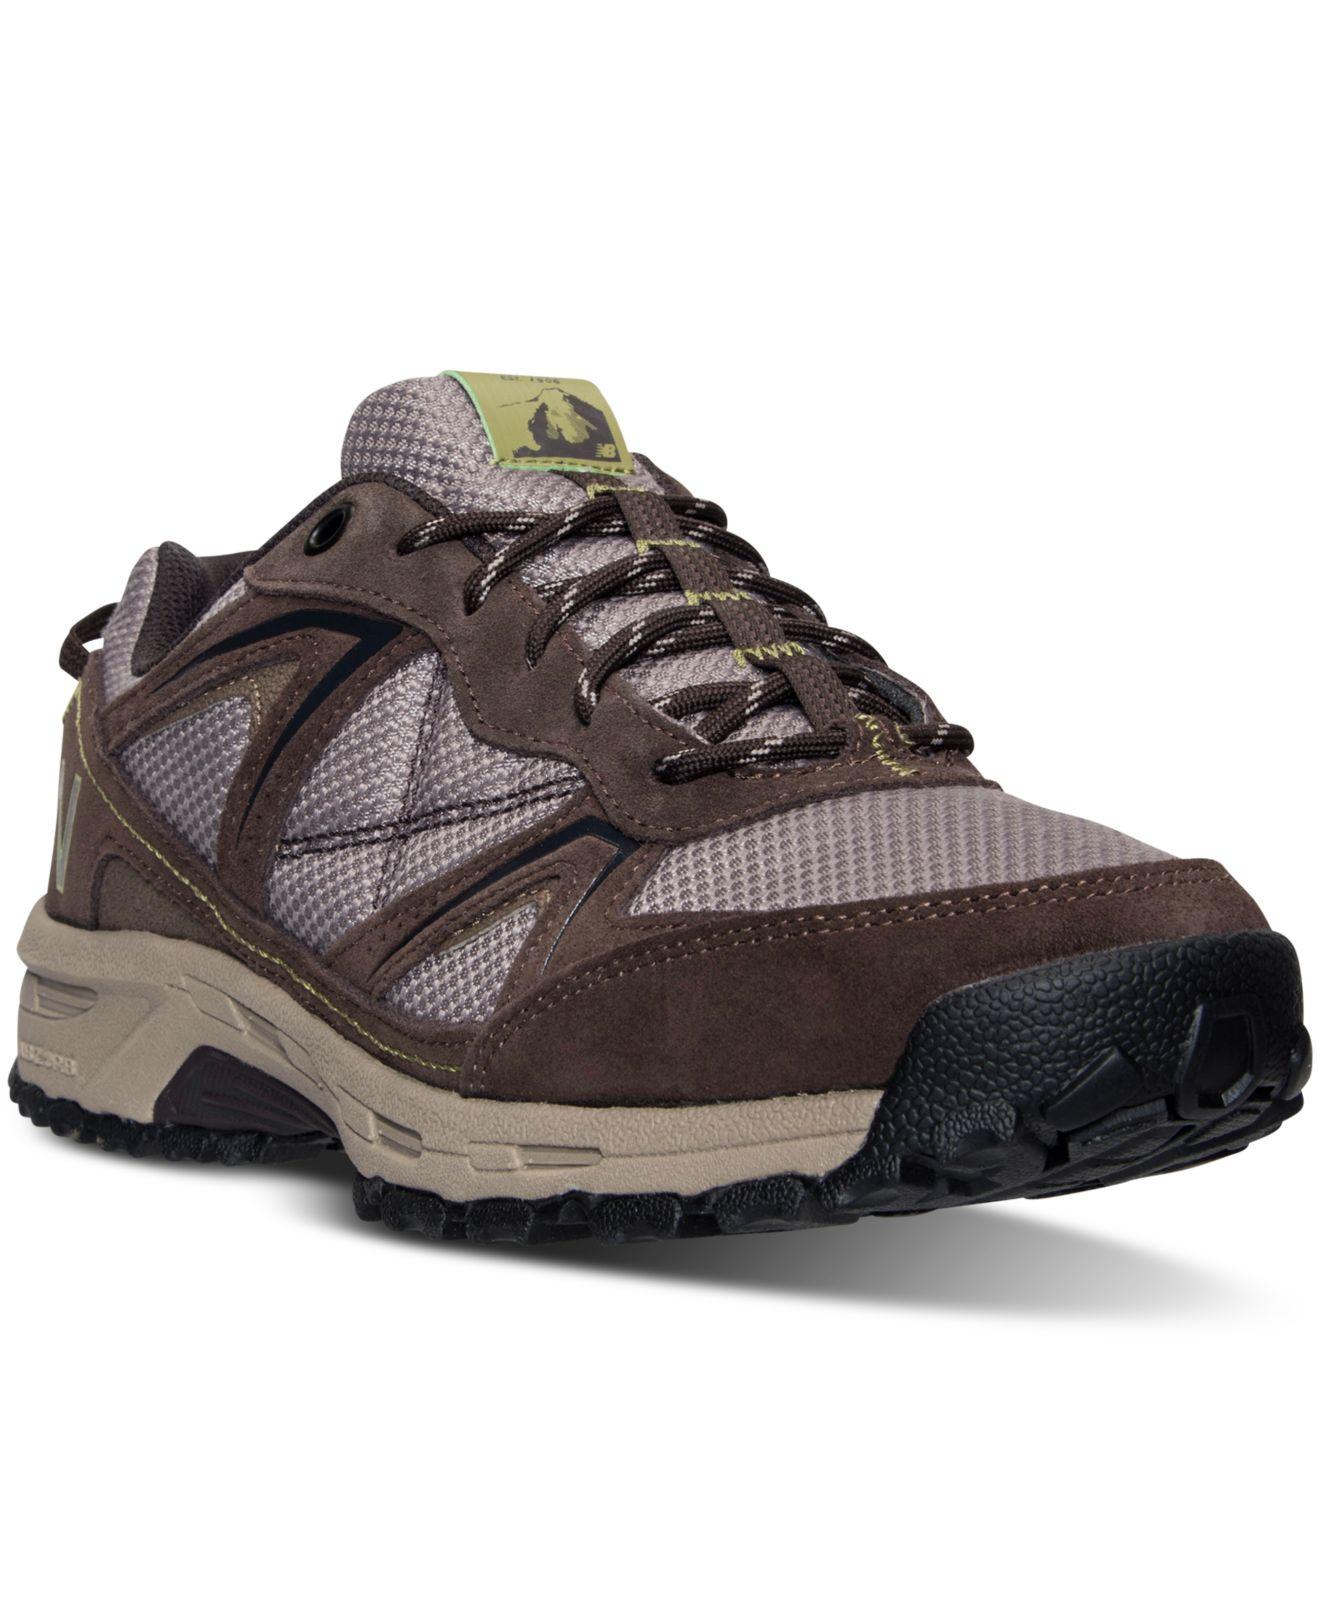 new balance men 39 s 659 wide width walking sneakers from. Black Bedroom Furniture Sets. Home Design Ideas